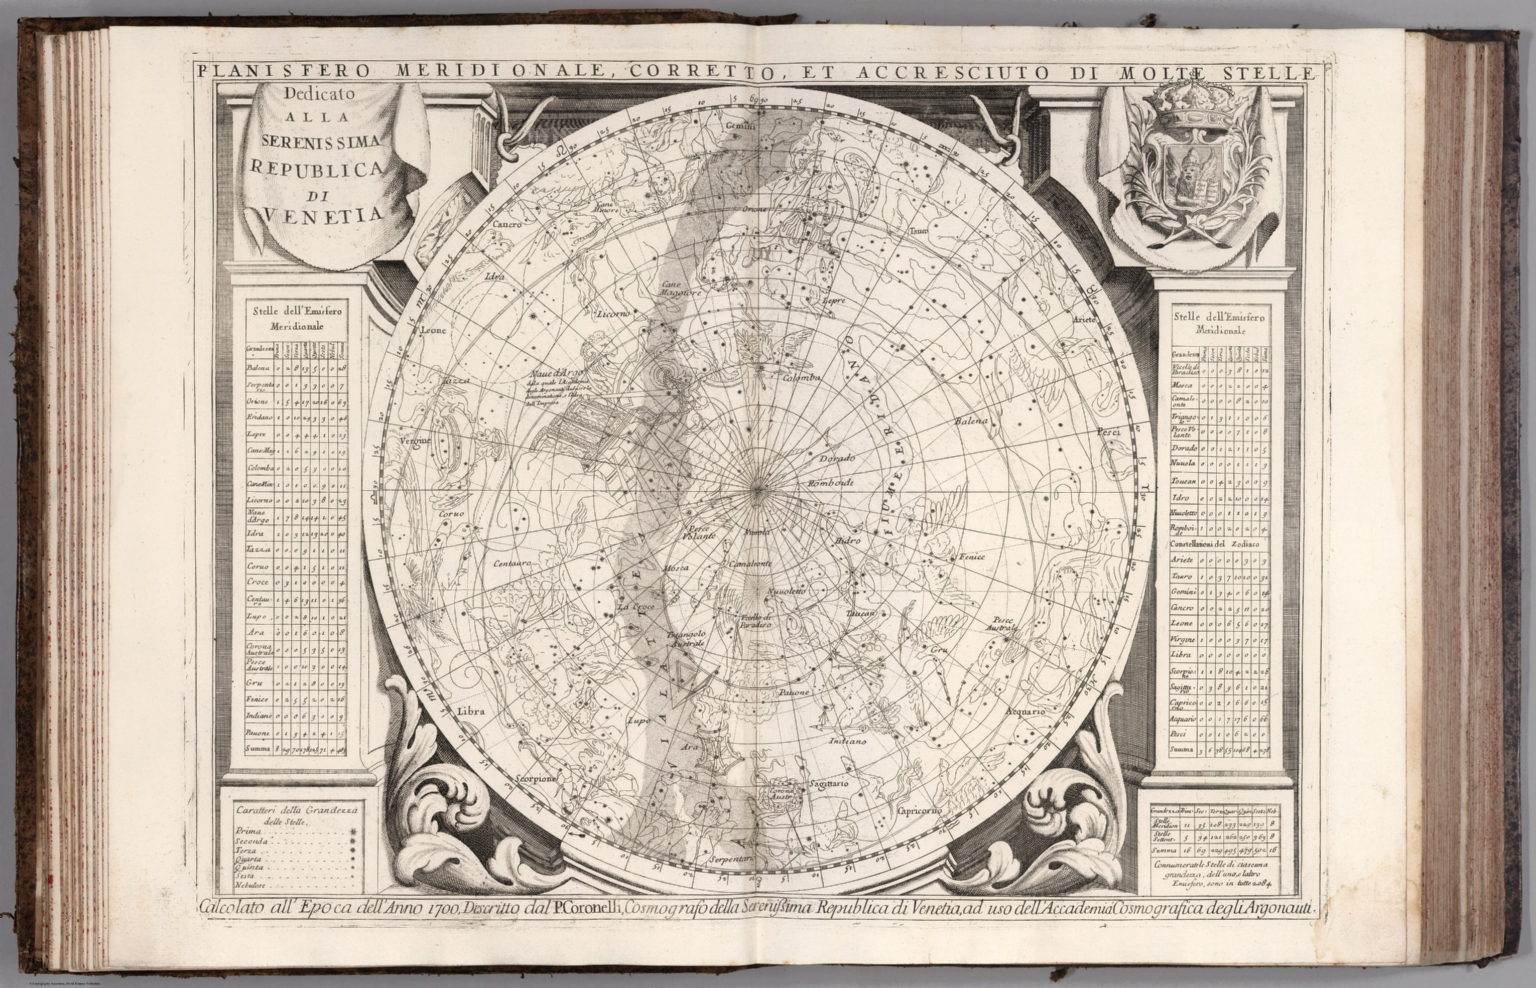 Planisfero Meridionale David Rumsey Historical Map Collection